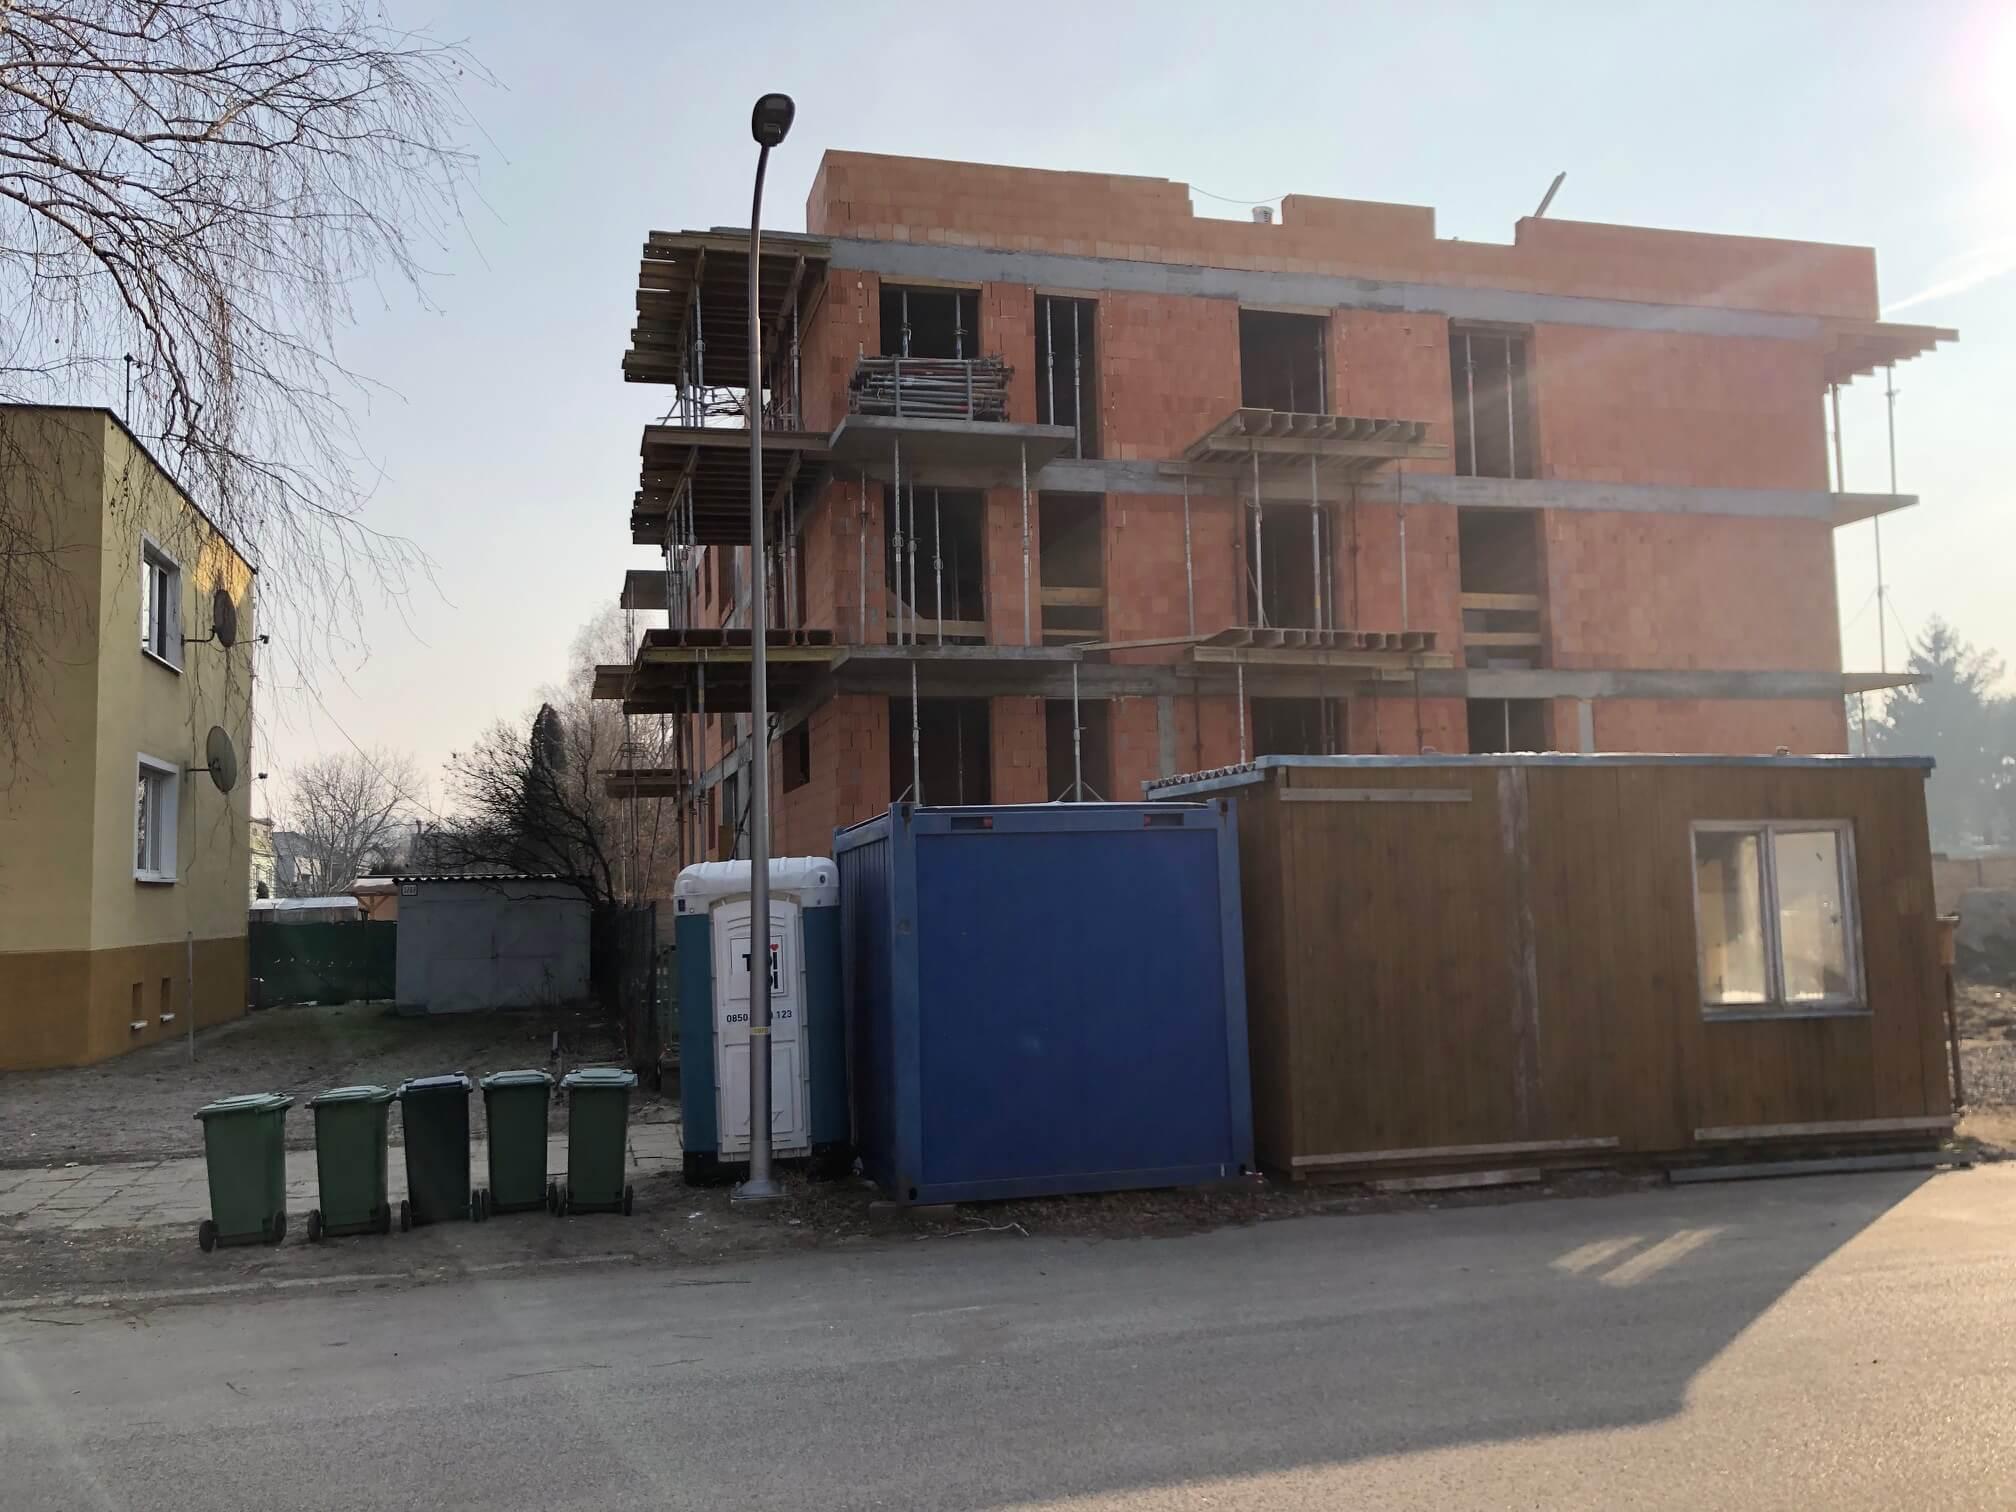 Novostavba 3 Izbový, M-House, Malacky centrum, 70,05m2, Loggia 7,48m2-24